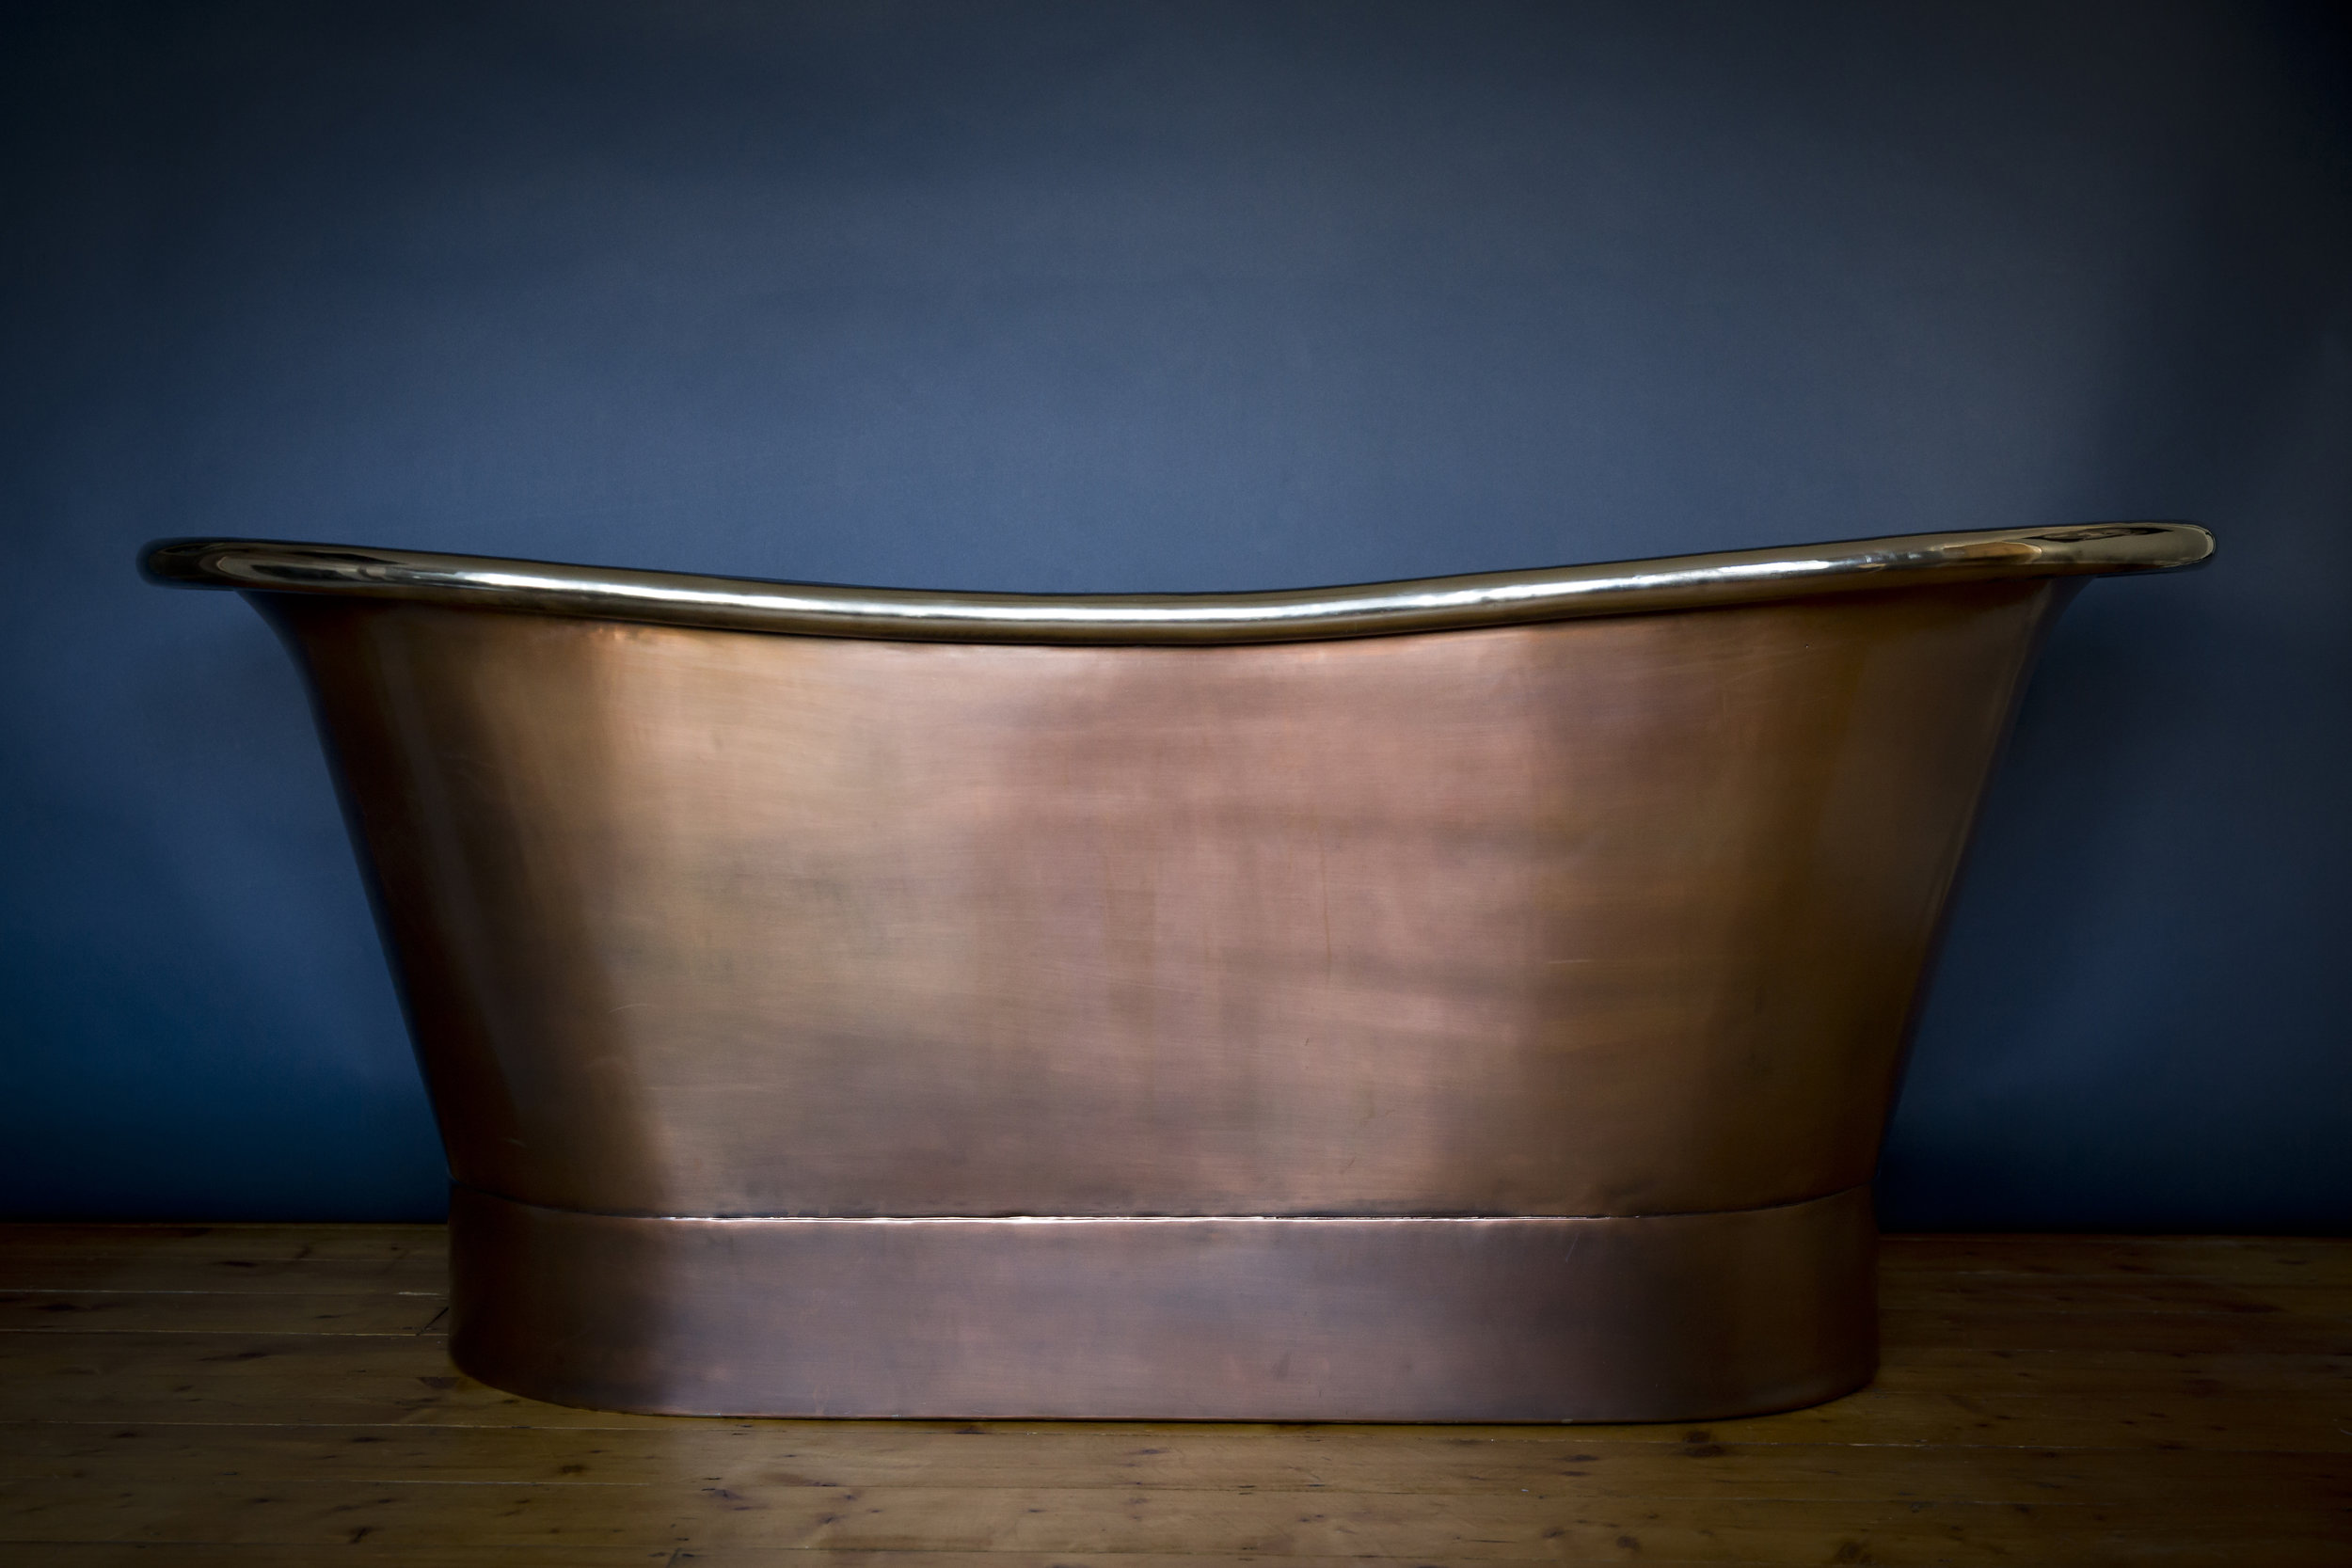 Copper Bath02.jpg